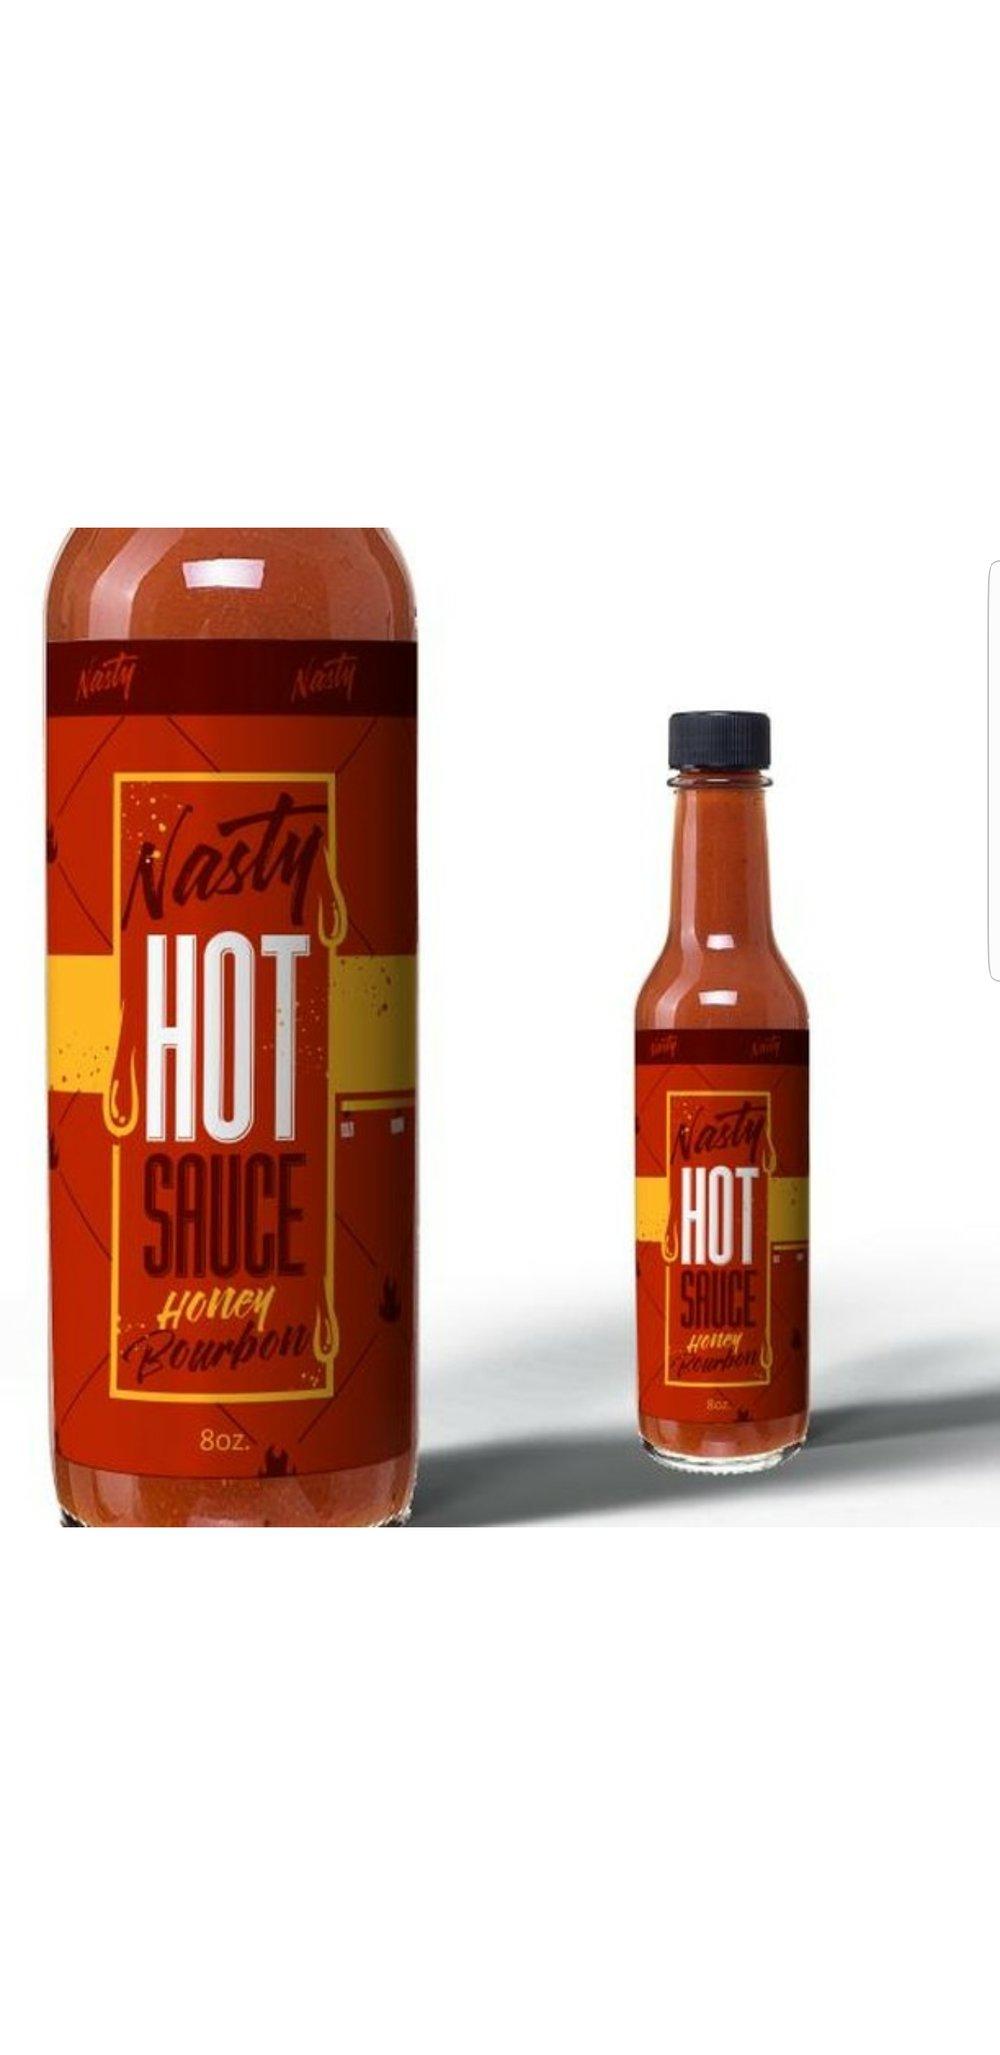 Image of Nasty Honey Bourbon Hot Sauce